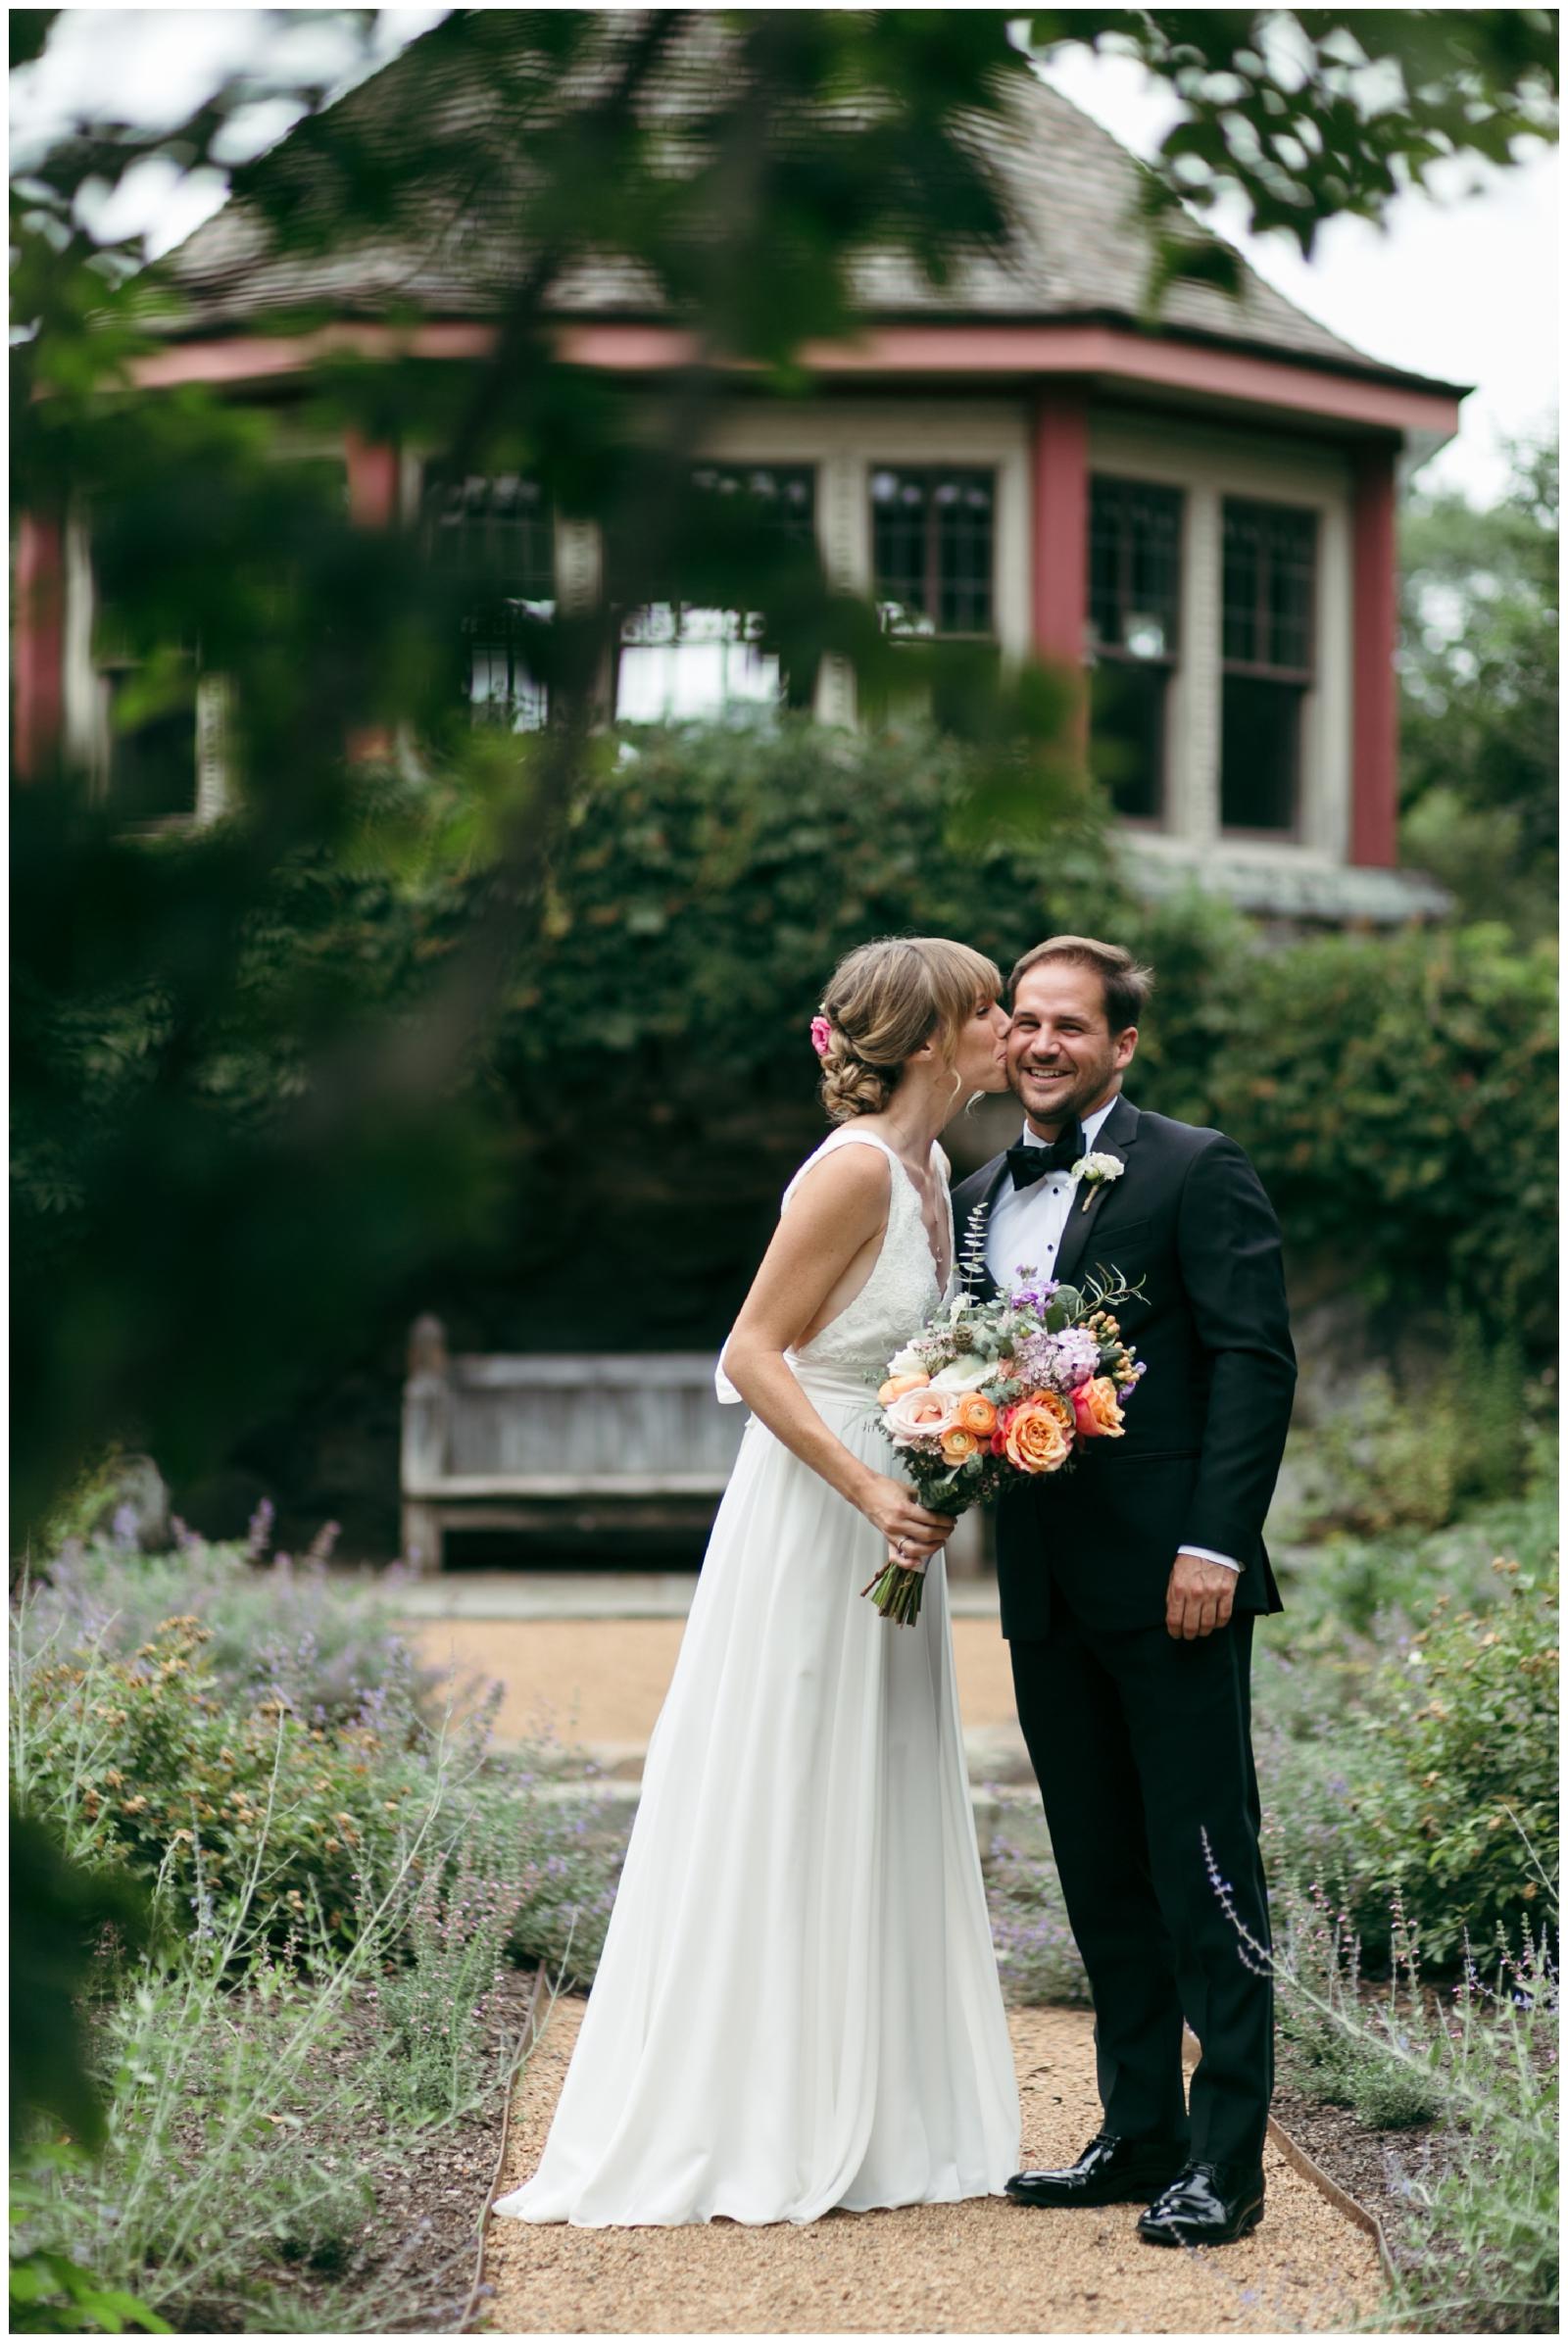 Moraine-Farm-wedding-Bailey-Q-Photo-Massachusetts-wedding-photpgrapher-028.jpg